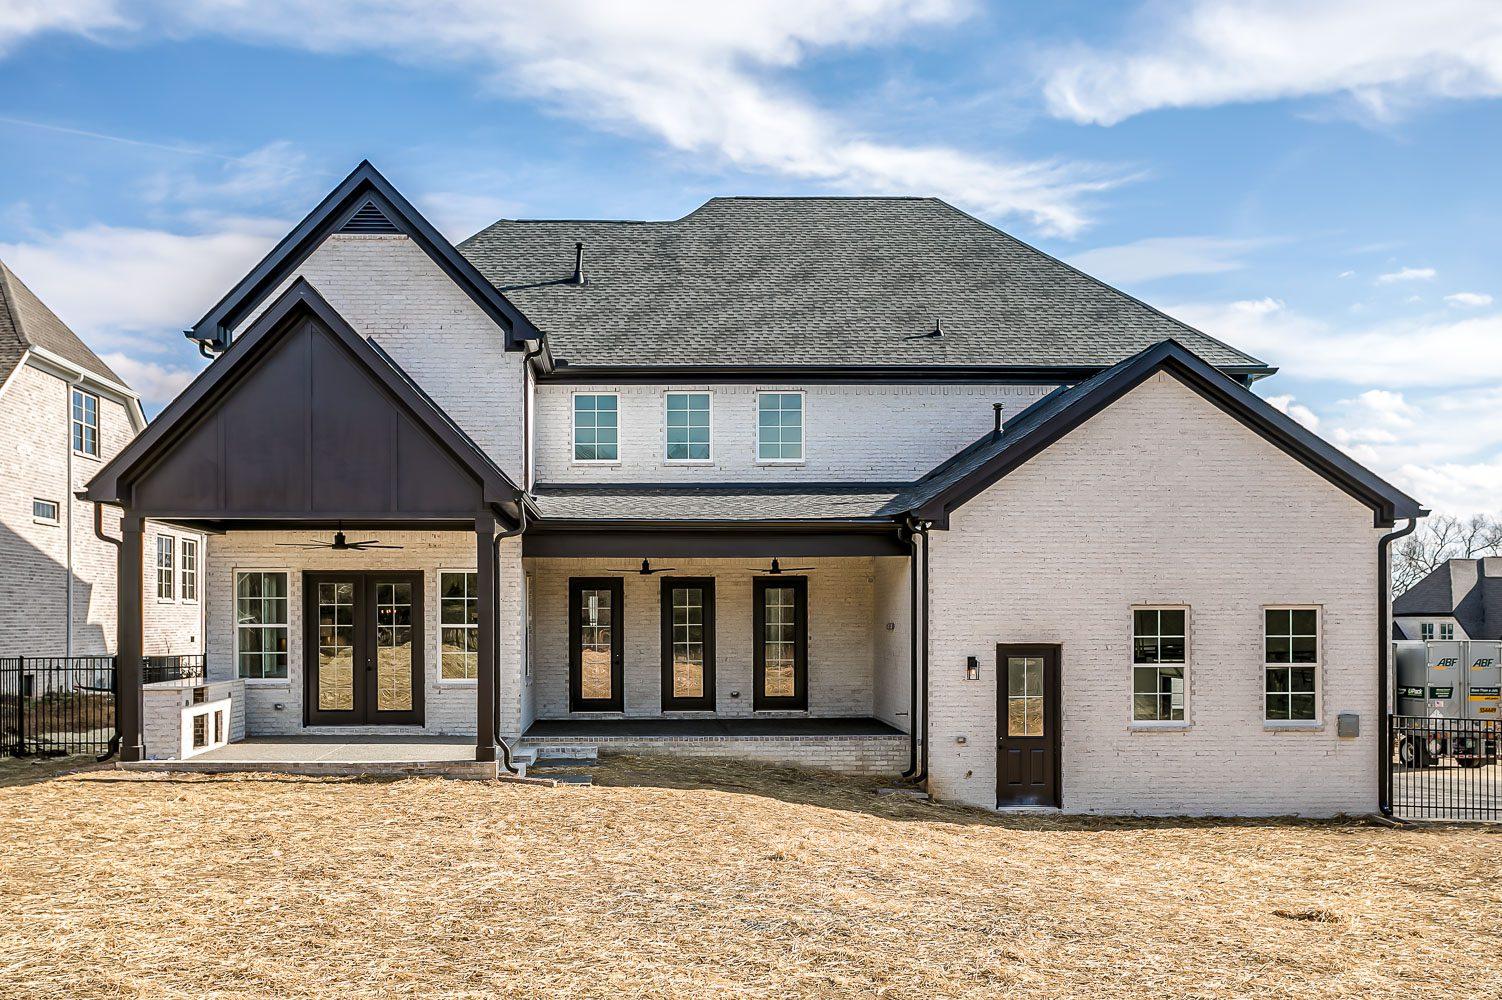 Luxury Homes by an Elegant Home Designer, Turnberry Homes in Nashville TN